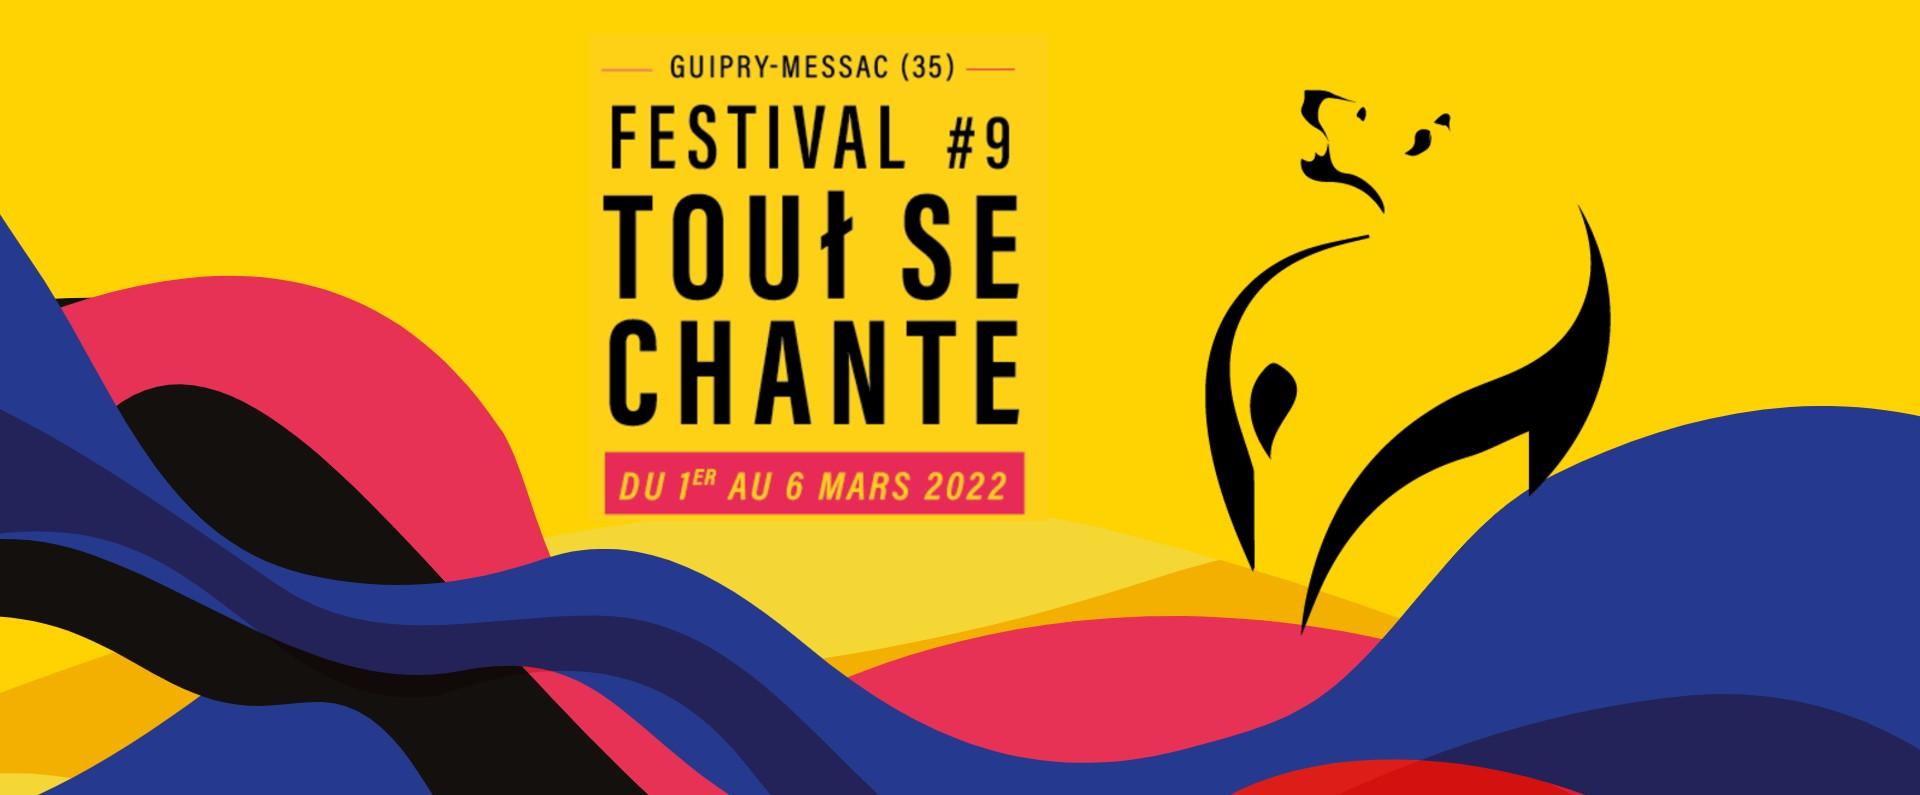 festival-tout-se-chante-2022-guipry-messac